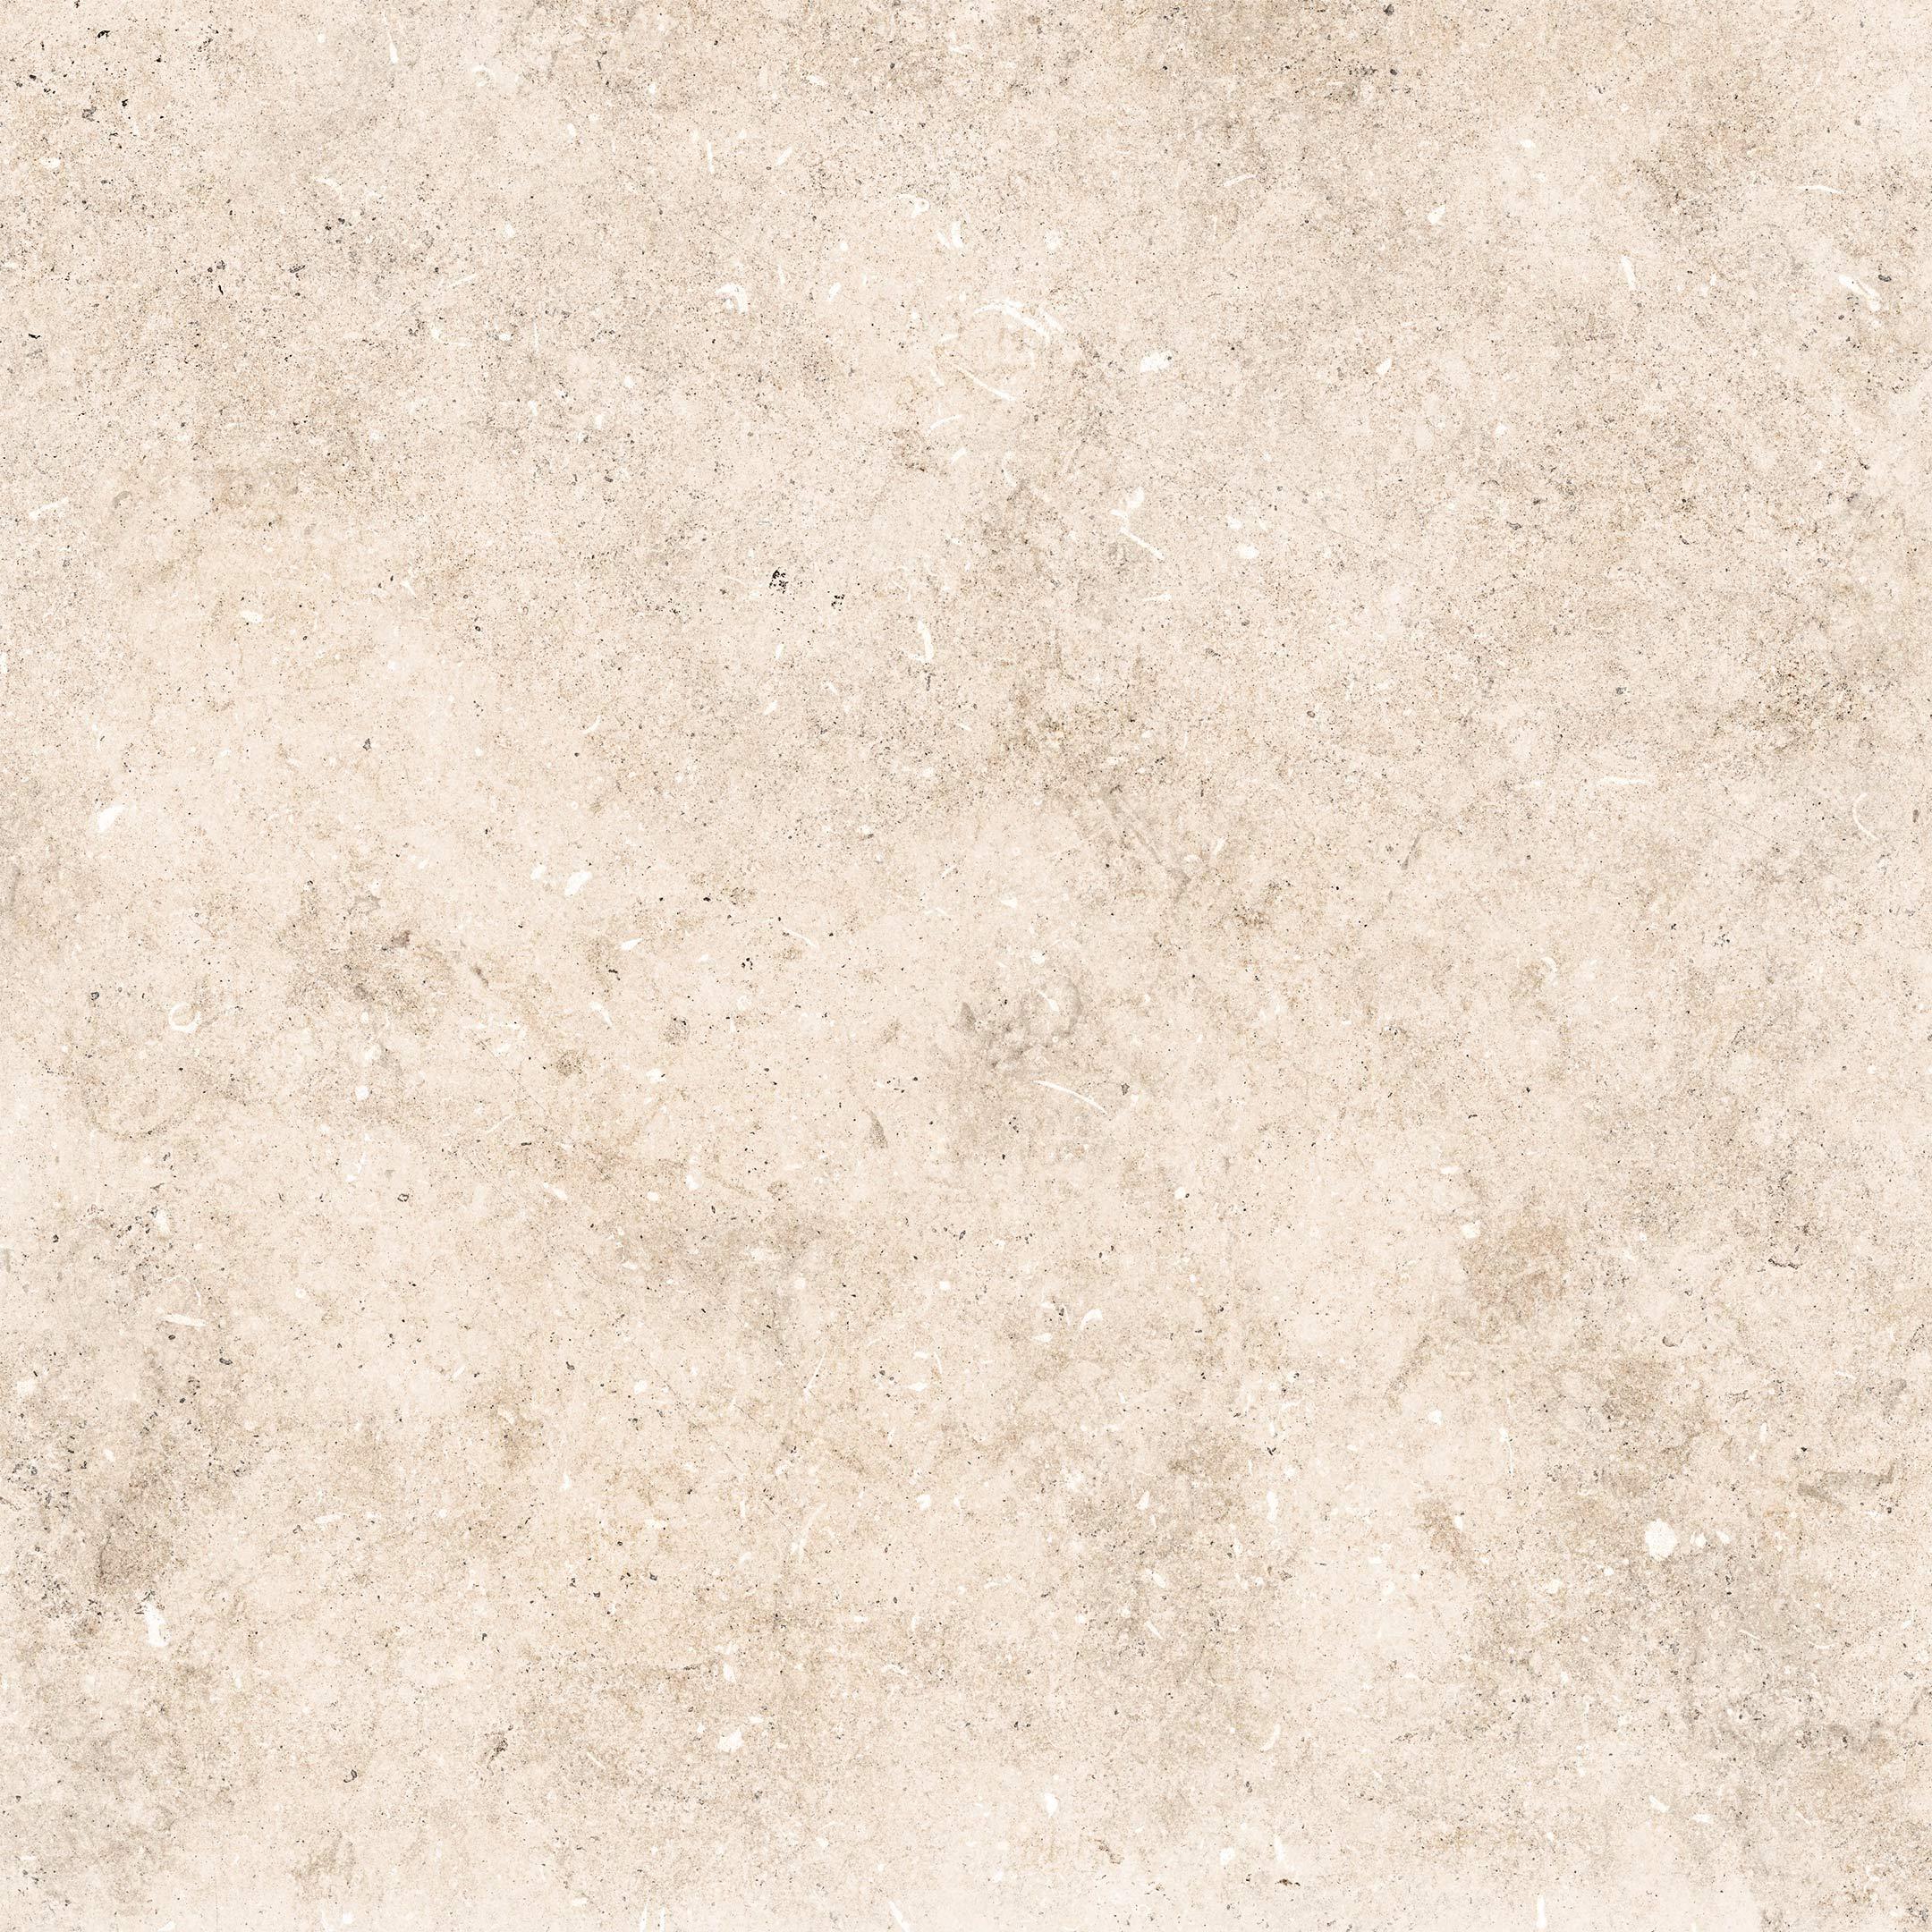 Керамогранит Керамин Авалон 3 бежевый 500х500х9 мм (5 шт.=1,25 кв.м) стоимость